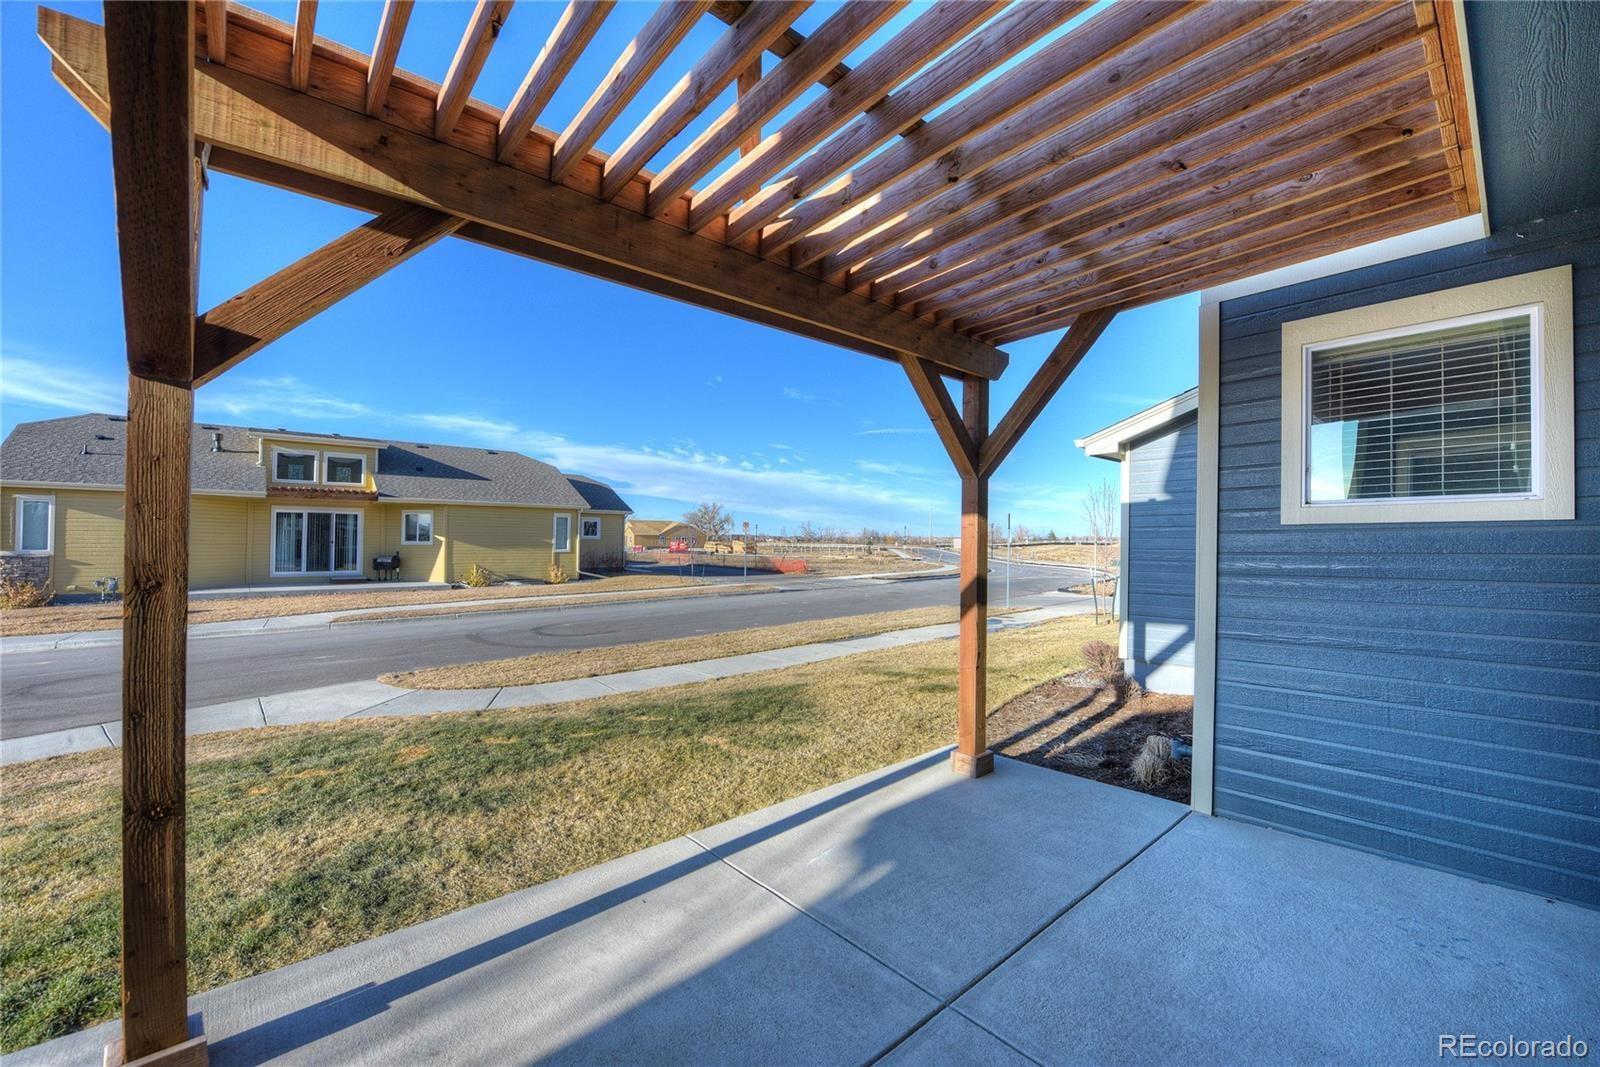 MLS# 3928660 - 30 - 1444 Moonlight Drive, Longmont, CO 80504